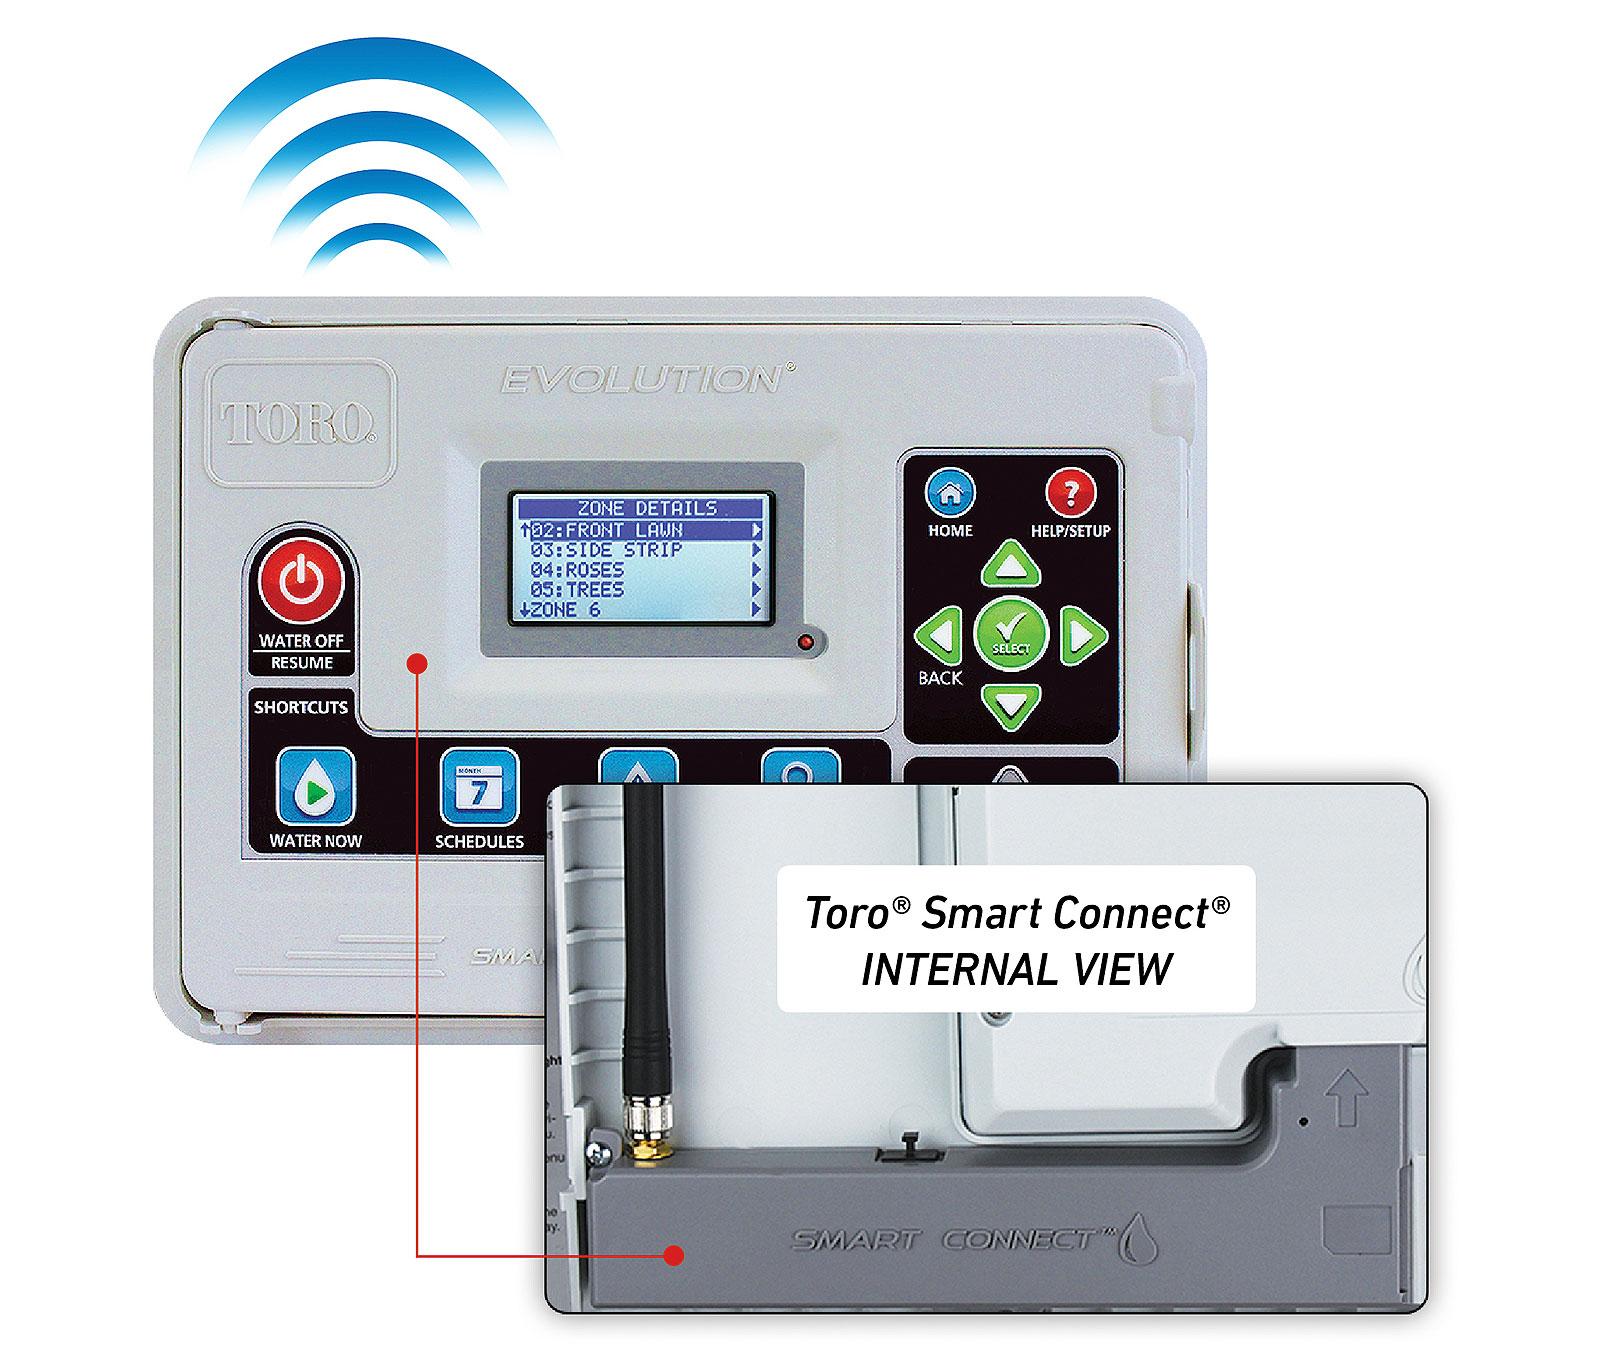 medium resolution of toro evolution series controller rh toro com toro wheel horse tractors wiring toro ignition switch wiring